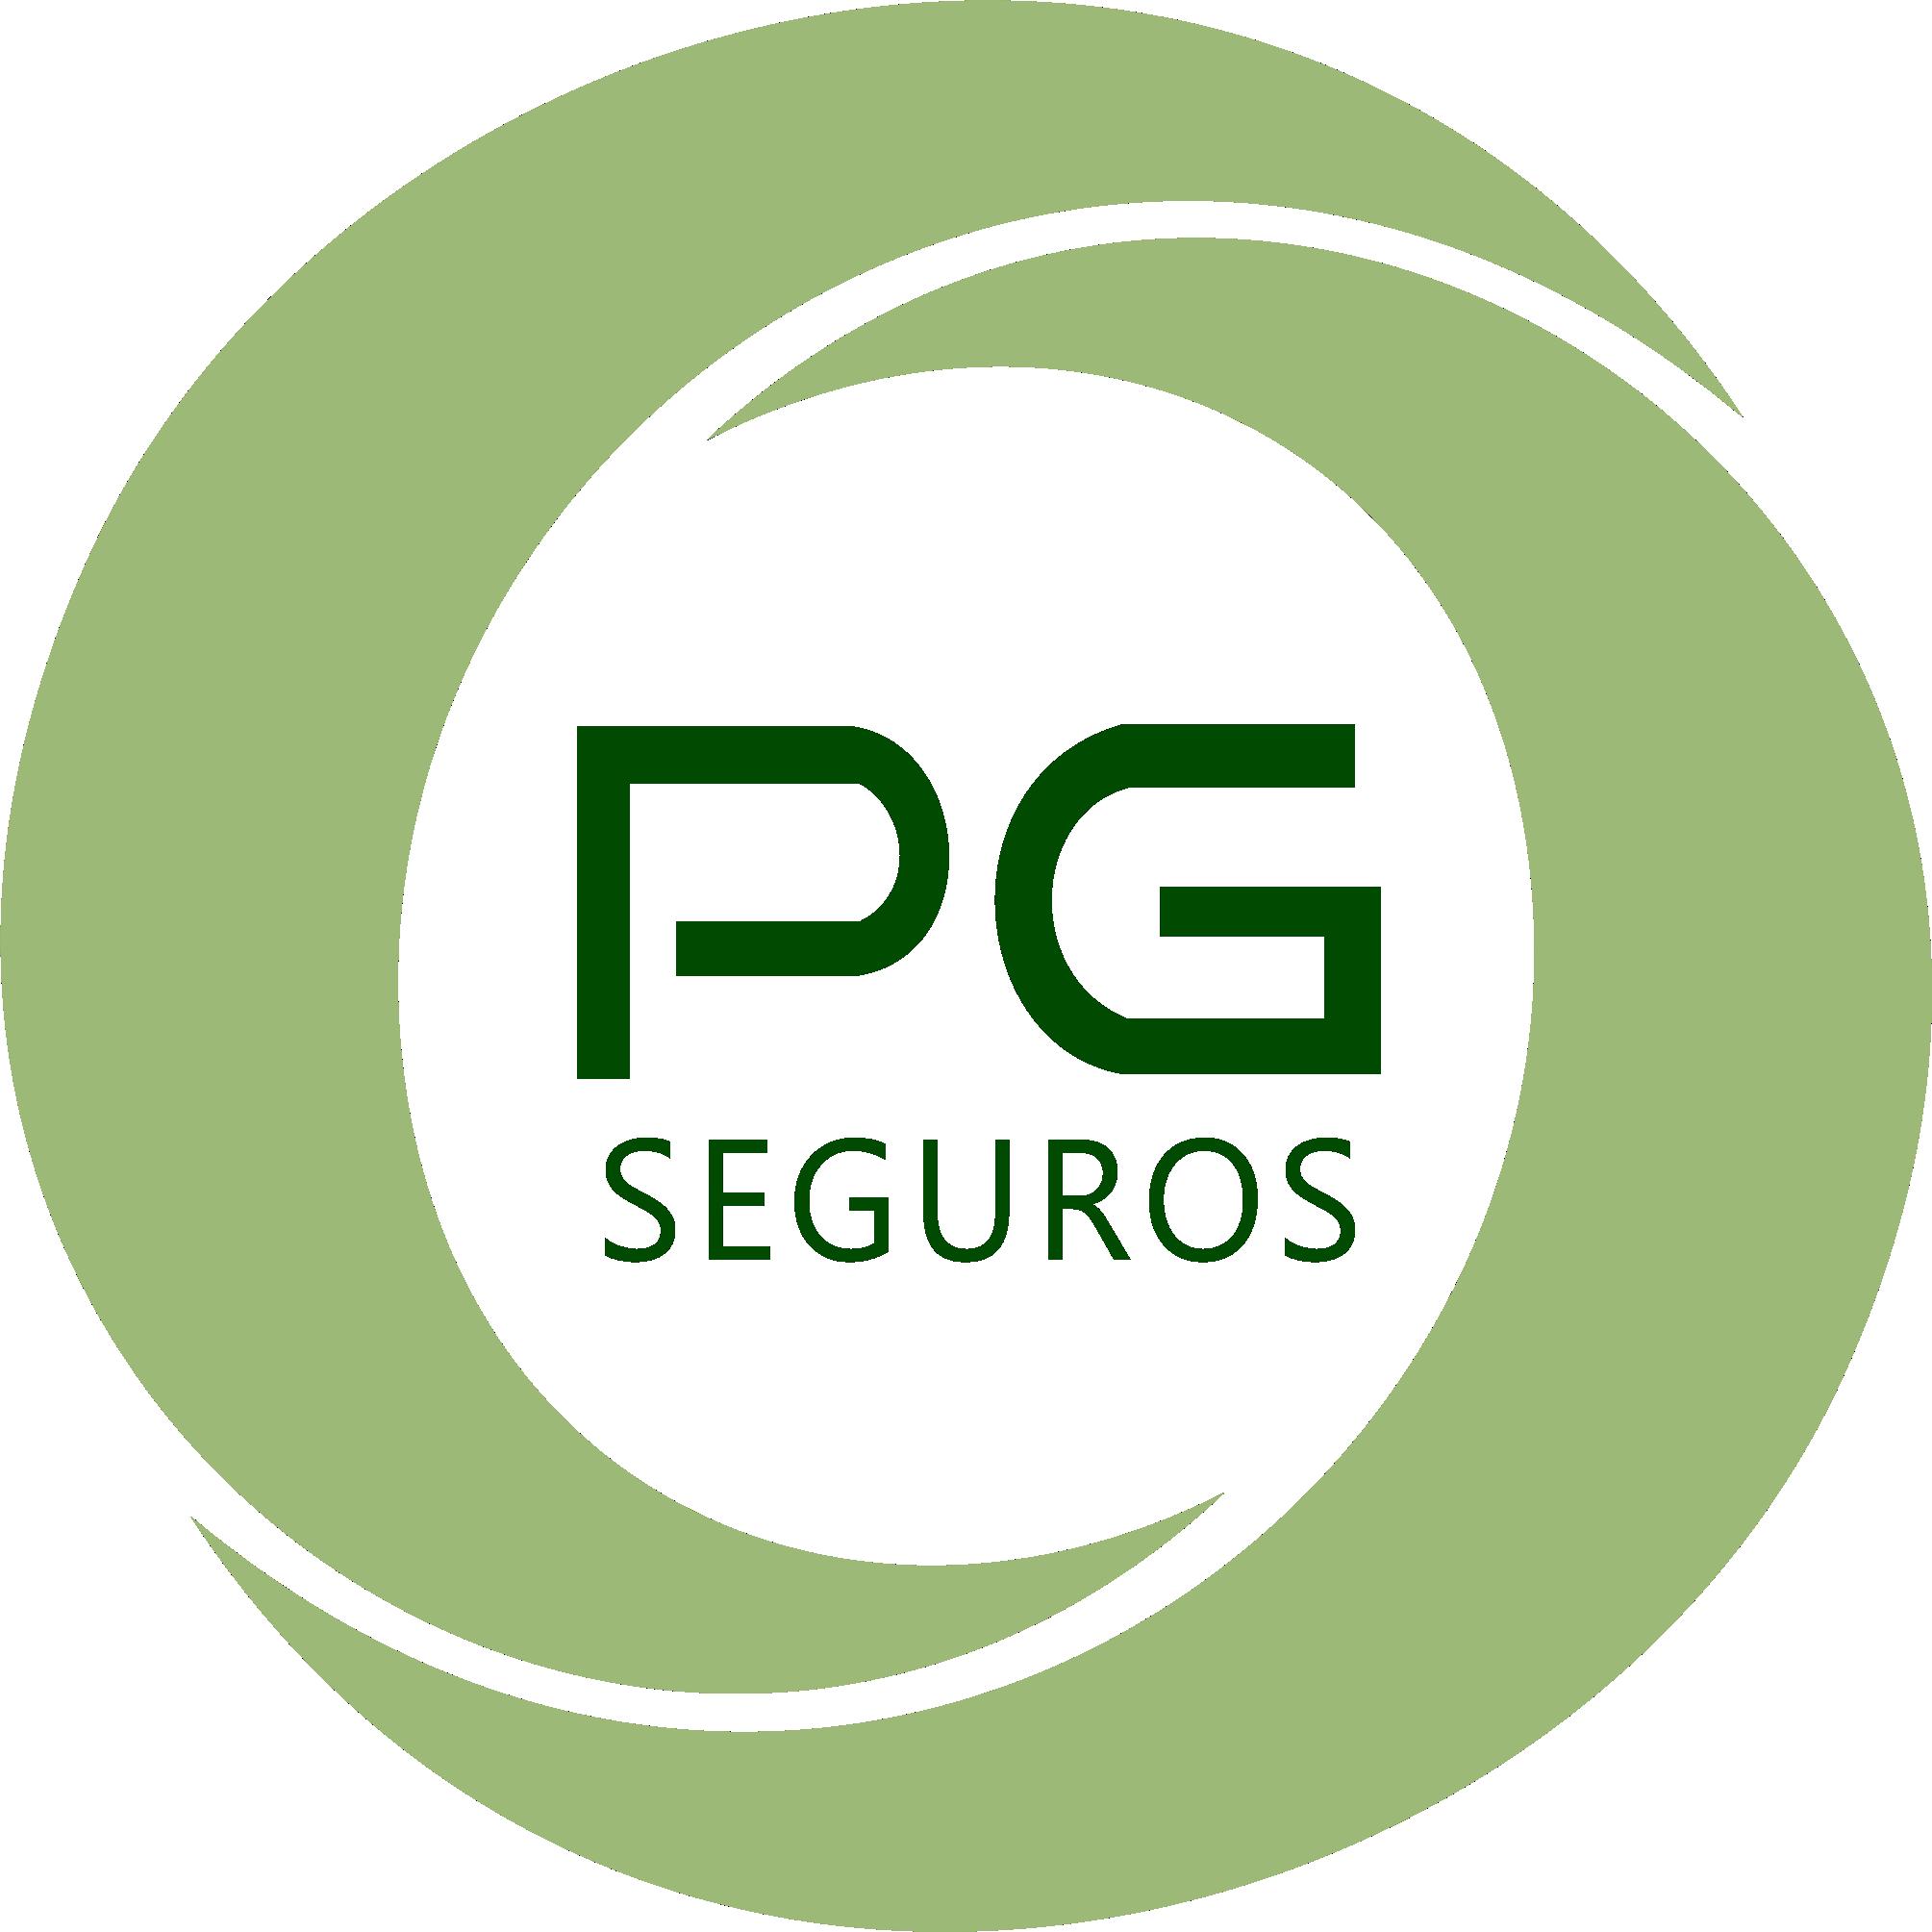 PG SEGUROS